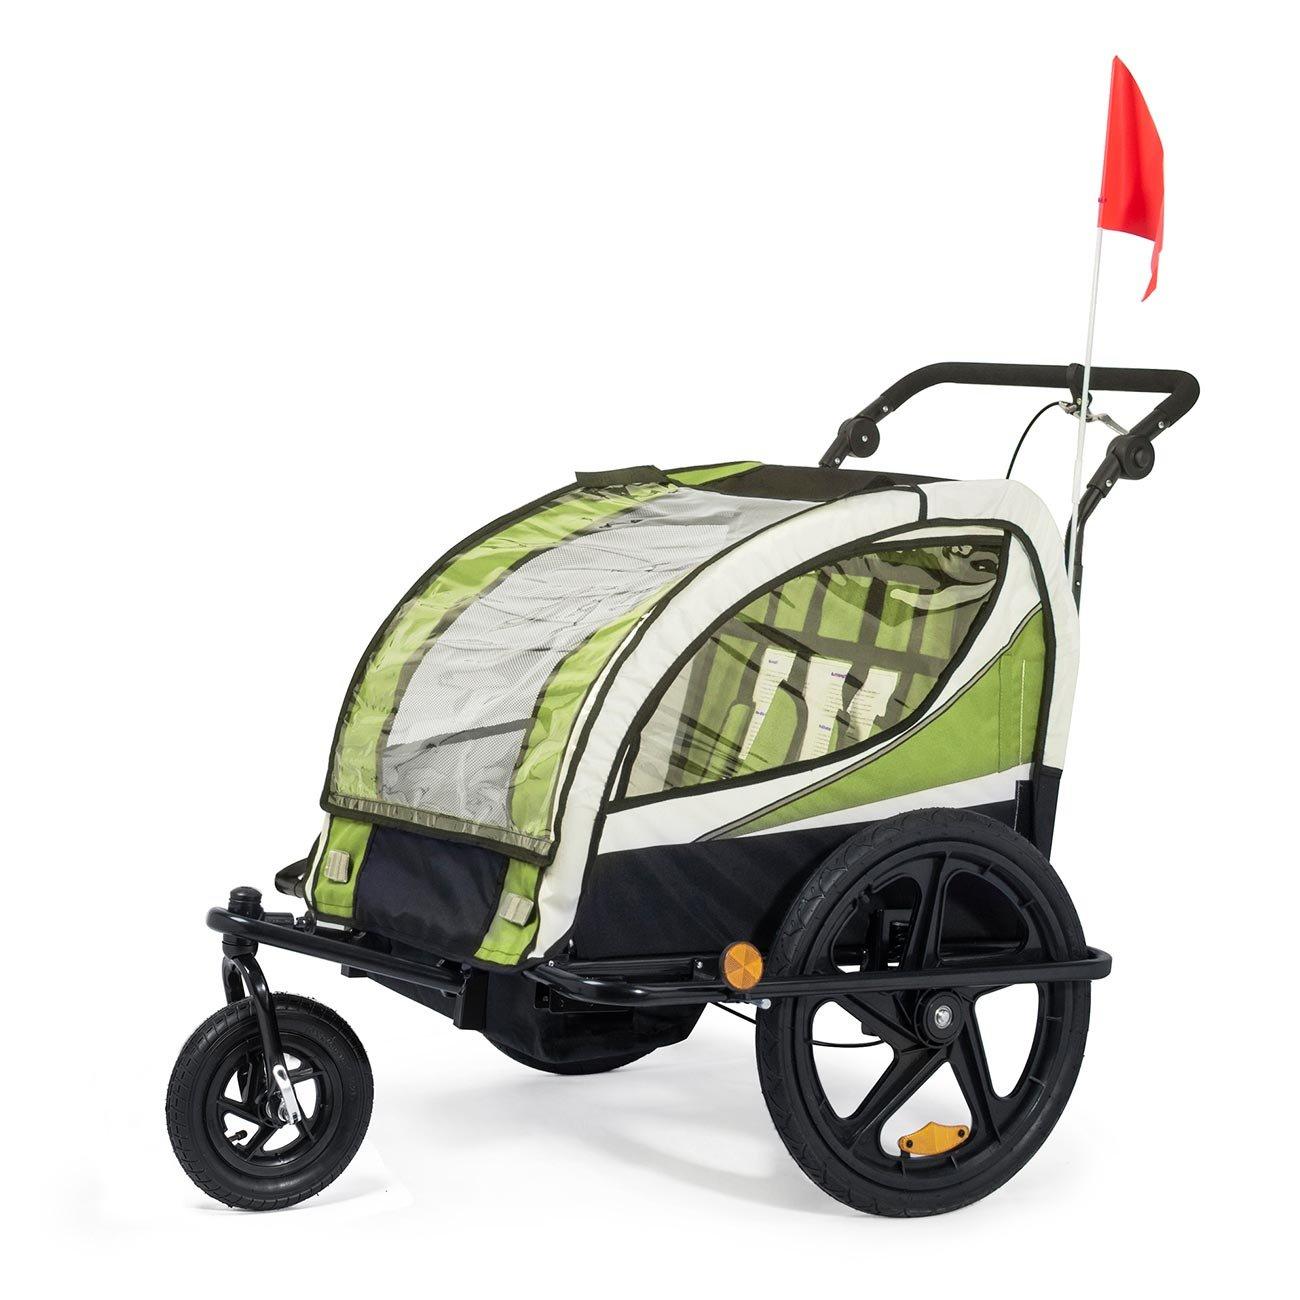 SAMAX Children Bike Trailer 2in1 Kids Jogger Stroller with ...